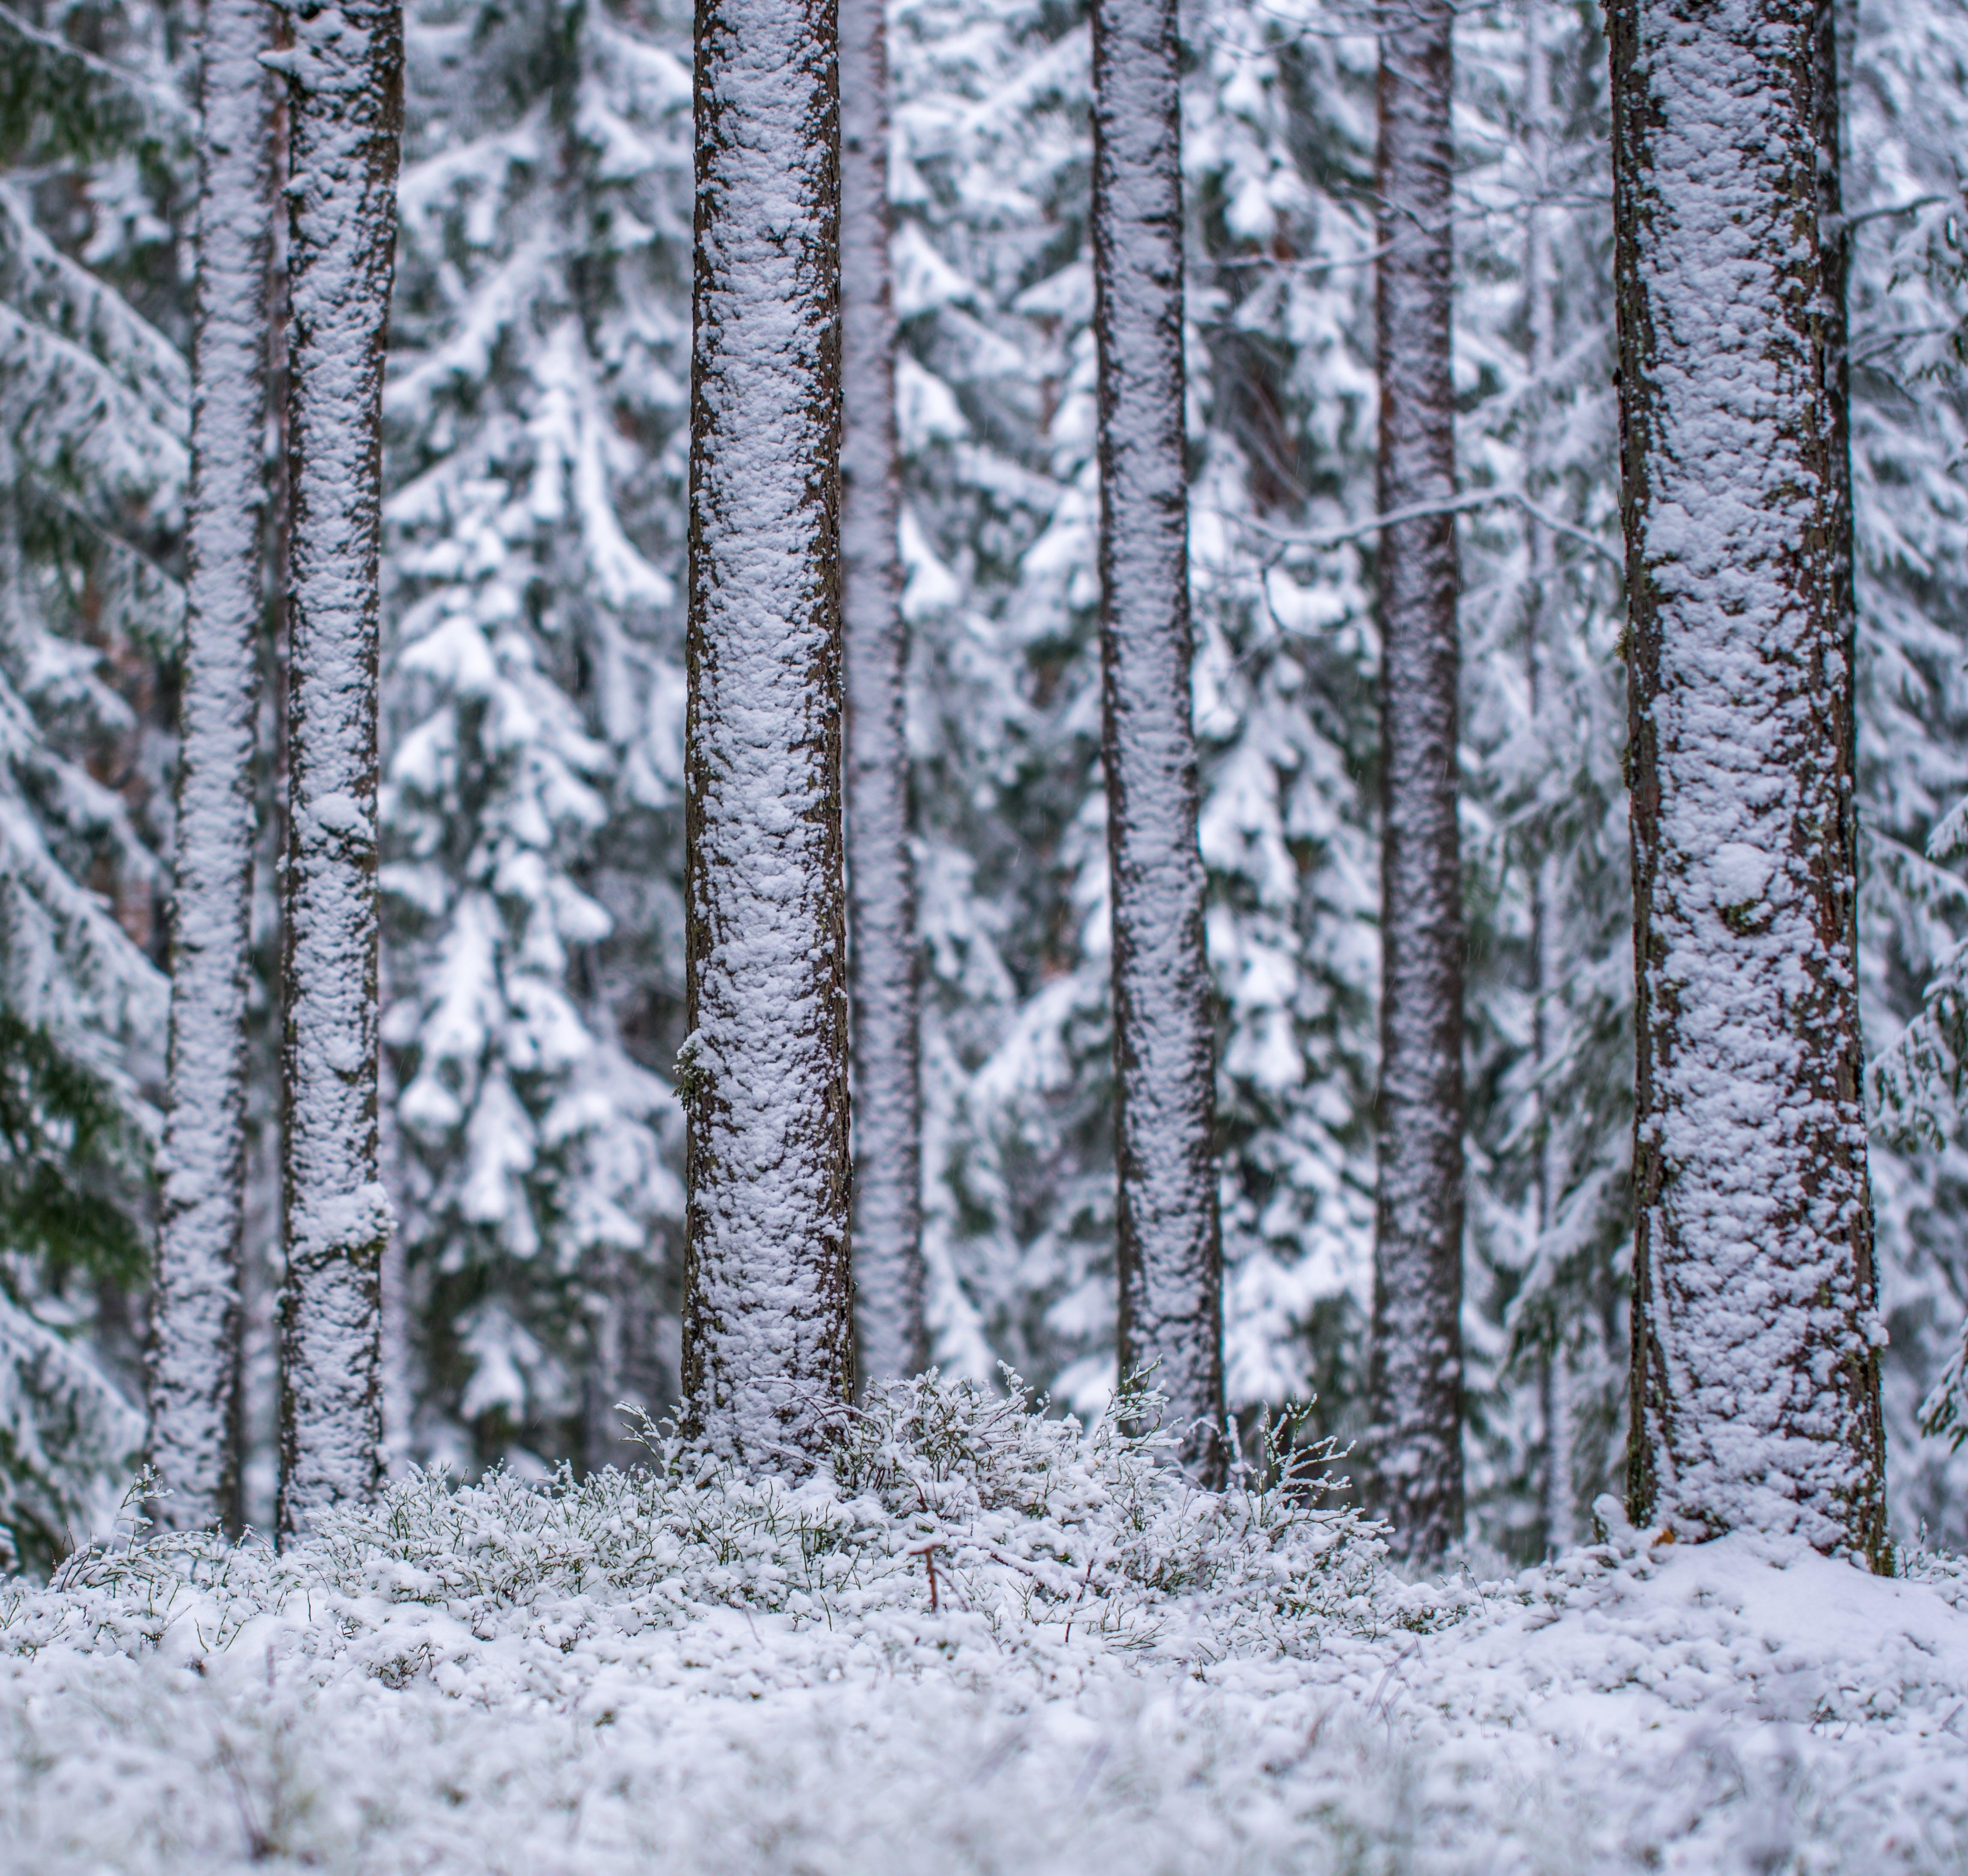 årstid, forkjølelse, frosset